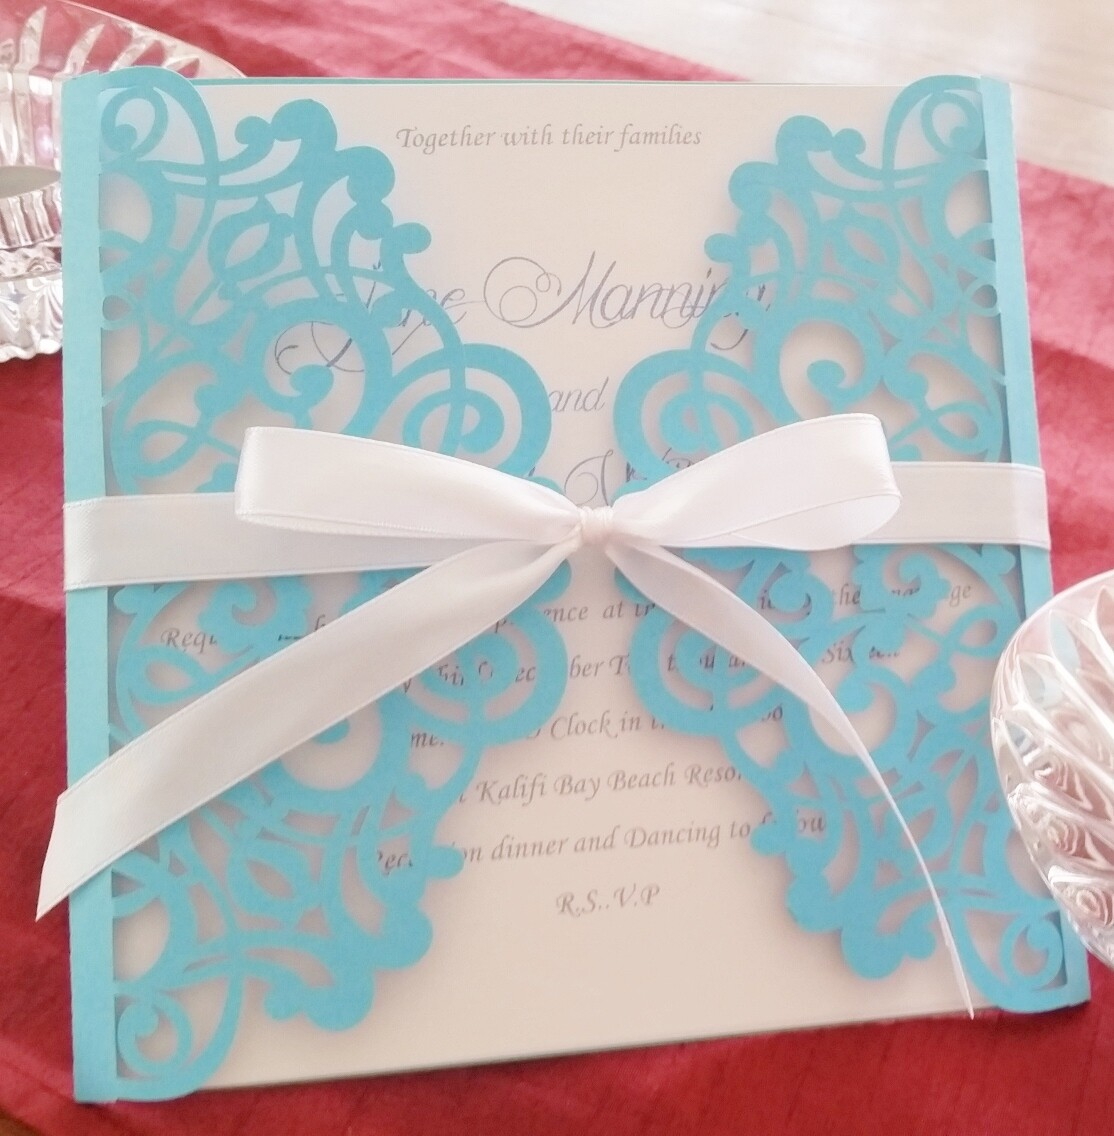 Pastel blue Wedding invitation card